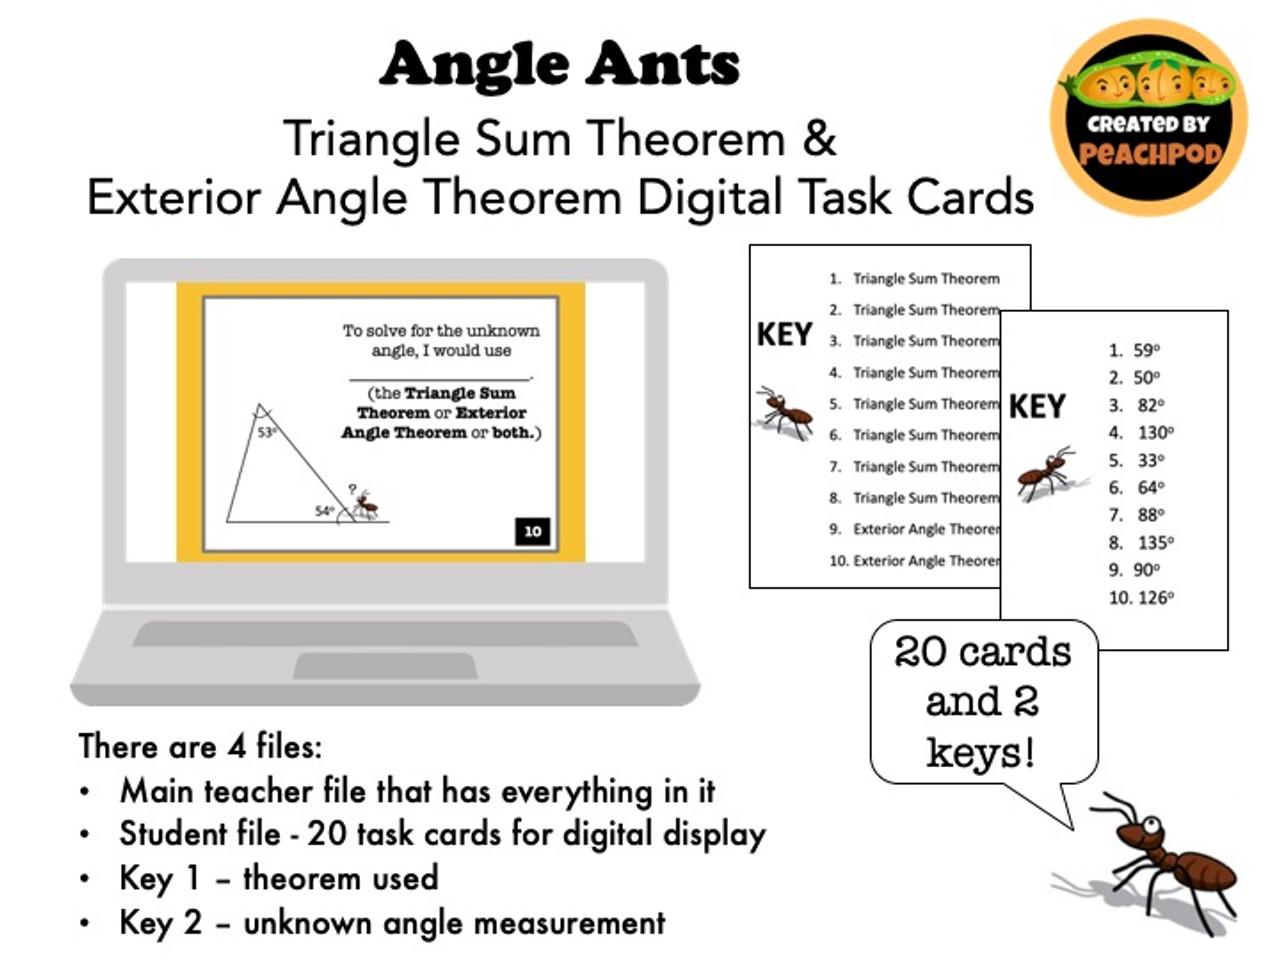 Angle Ants: Triangle Sum Theorem &  Exterior Angle Theorem Digital Task Cards